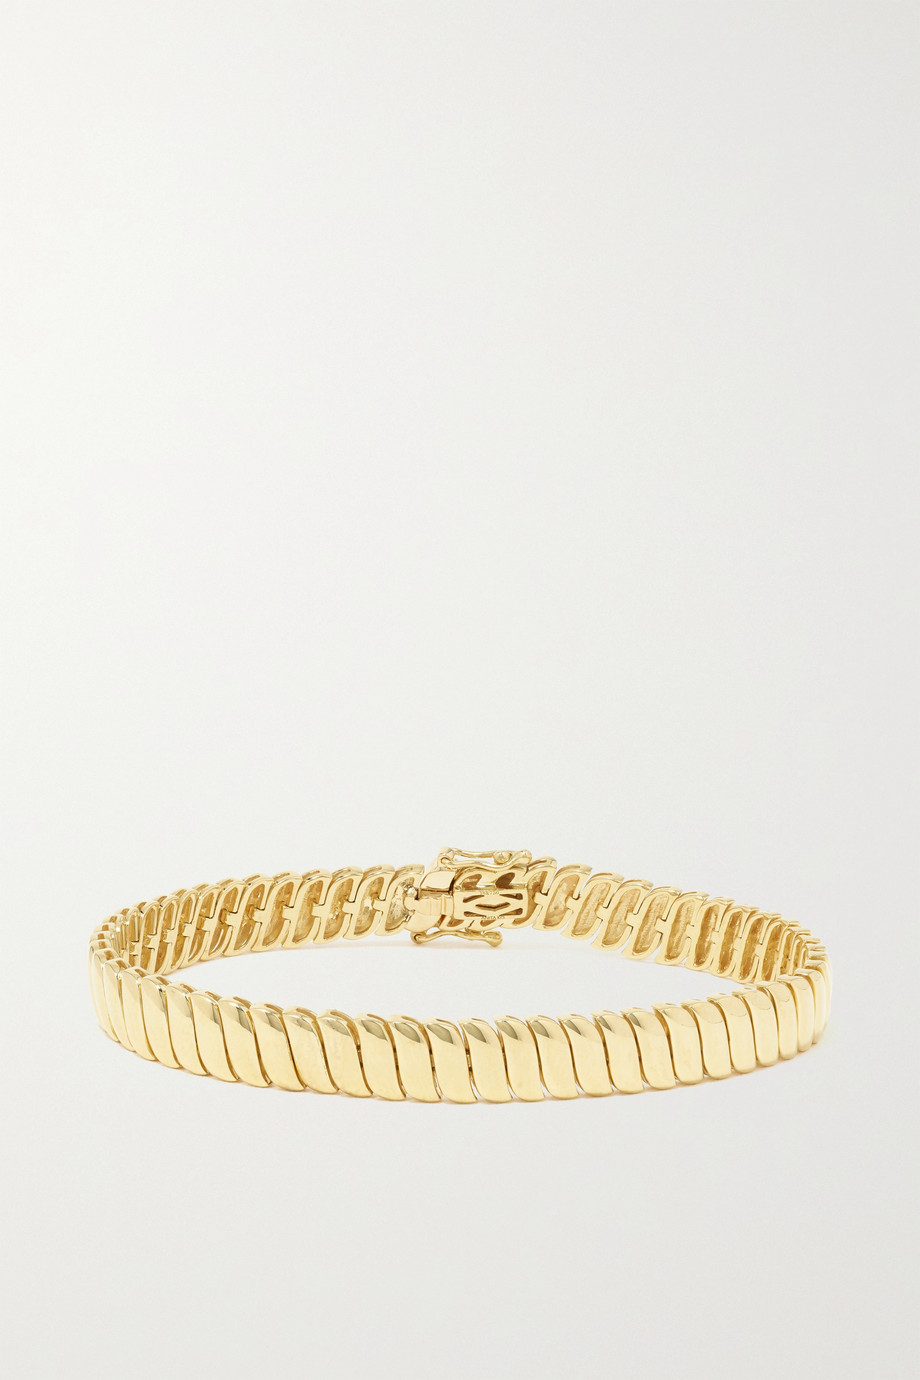 Anita Ko Zoe 18-karat gold bracelet